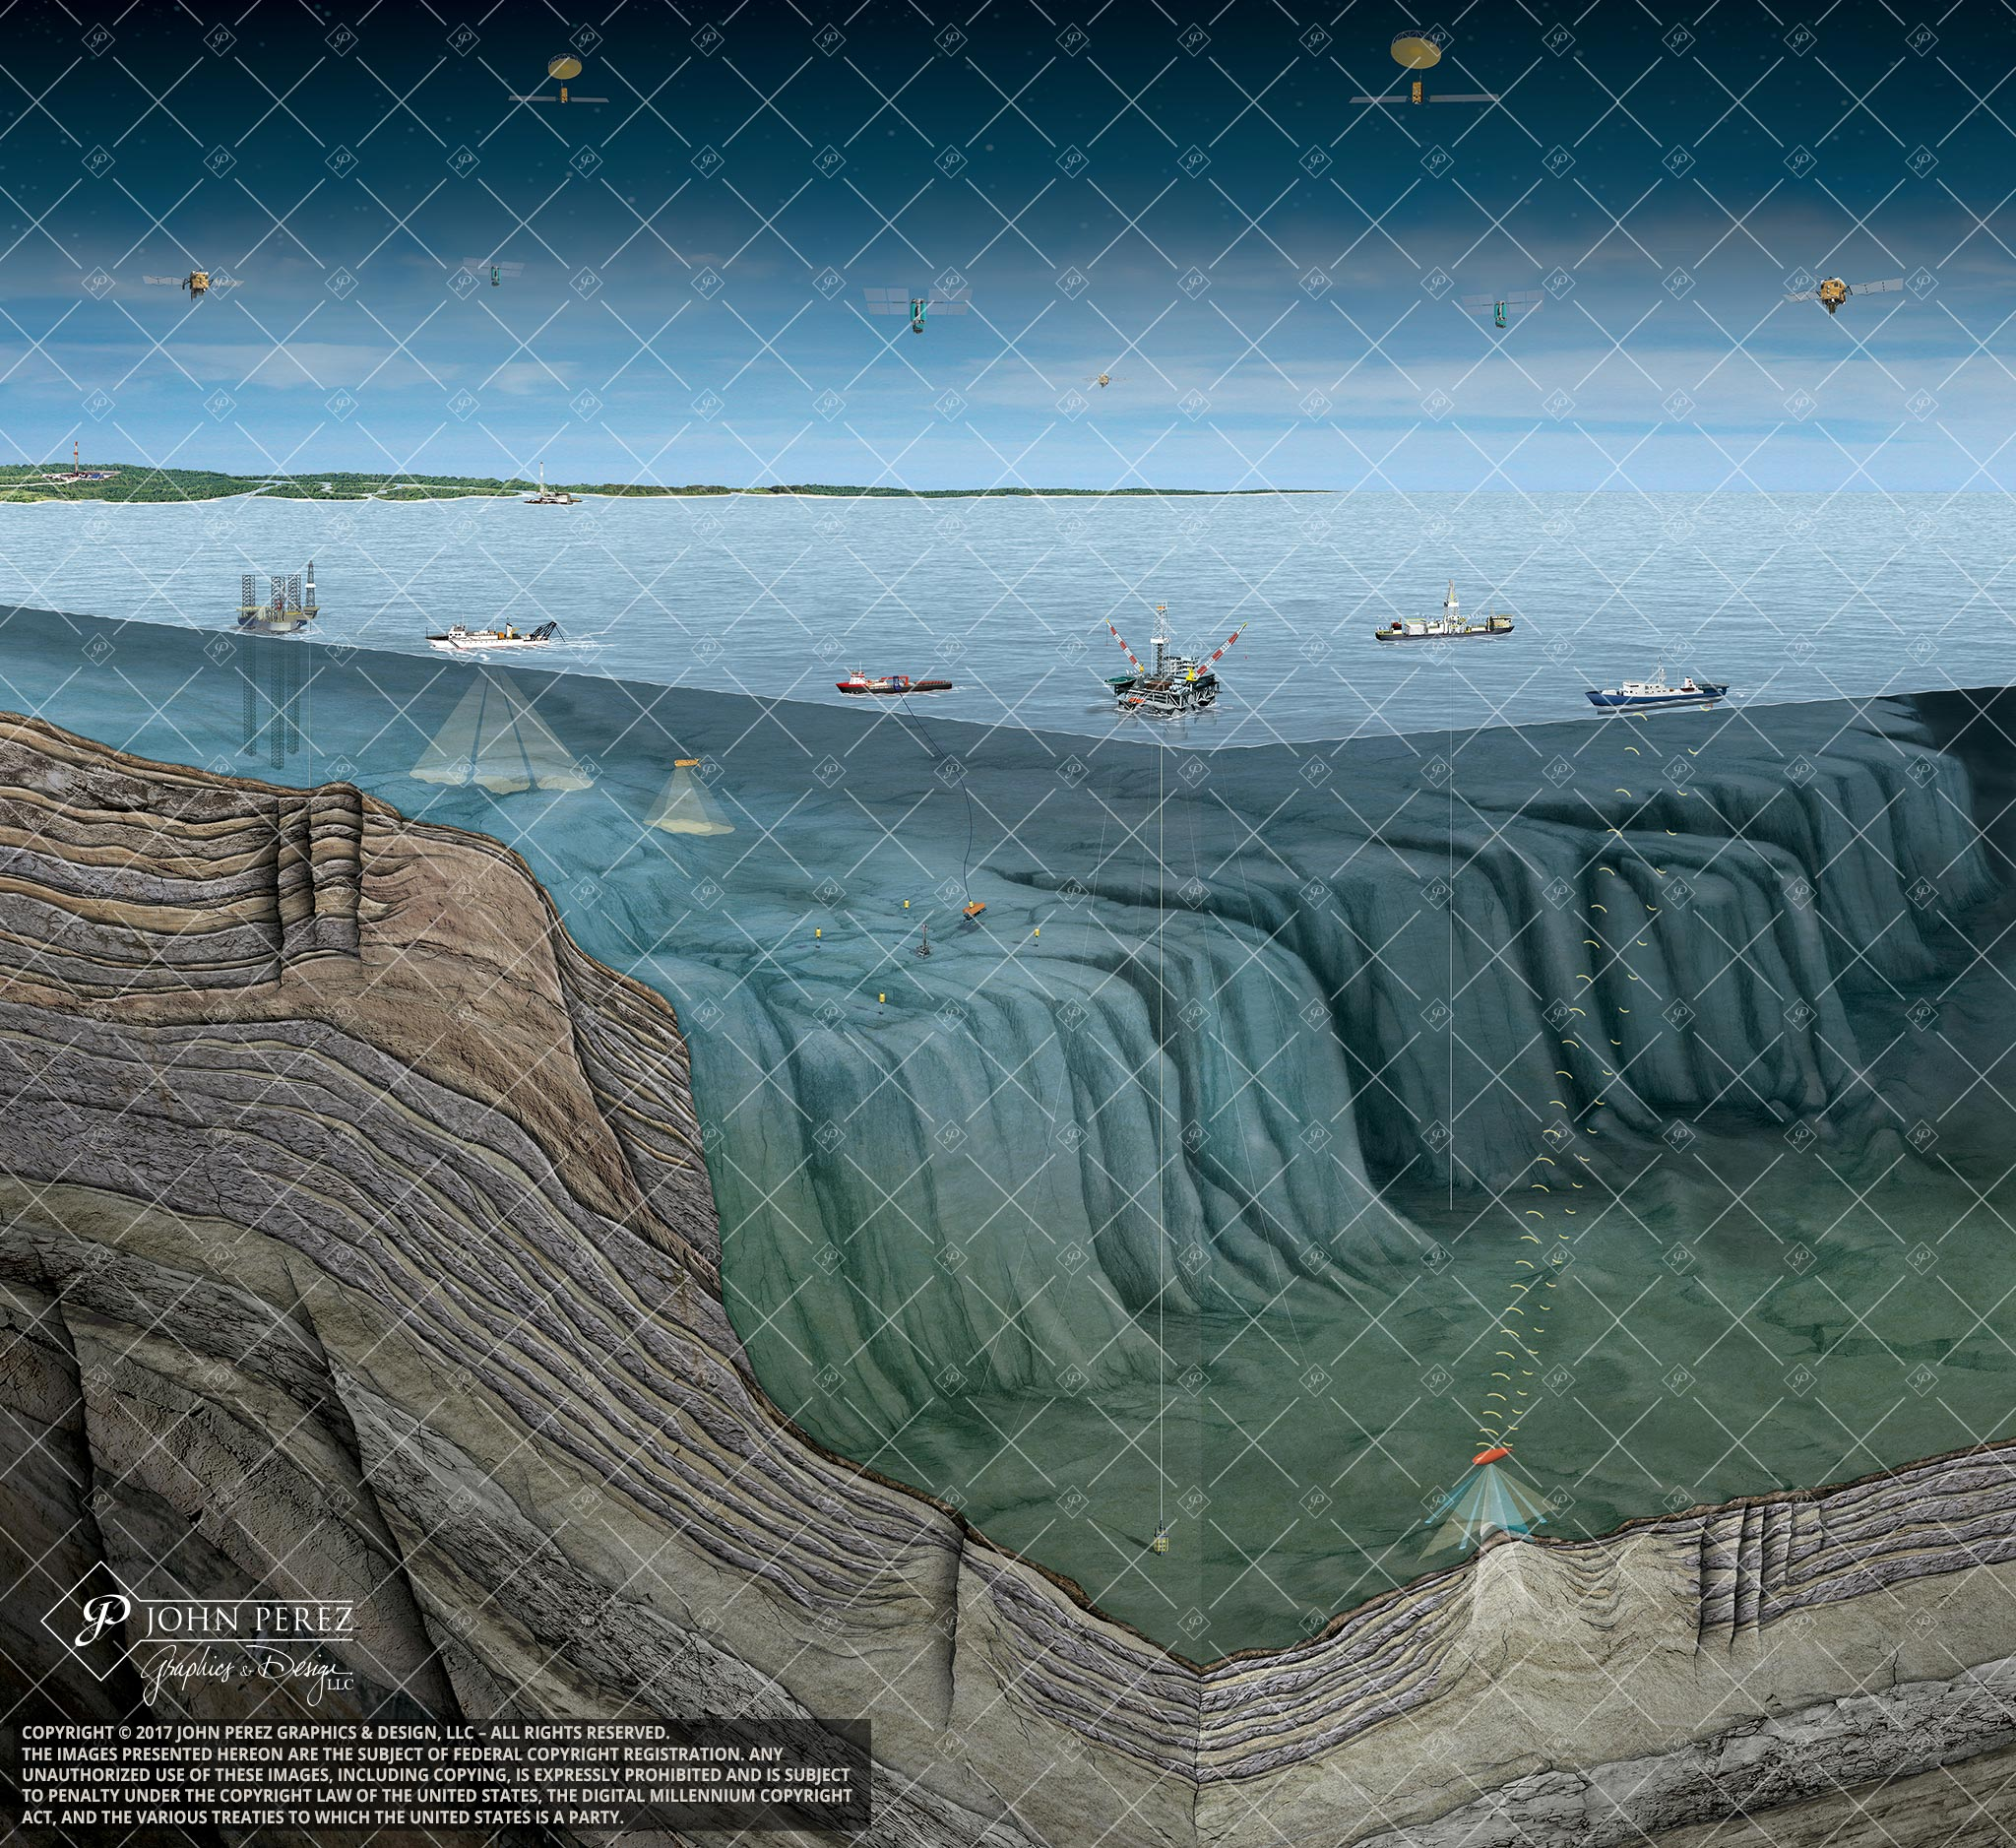 Offshore Technologies Oil Gas Illustration, John Perez Graphics, OS32, offshore drilling, geology illustration